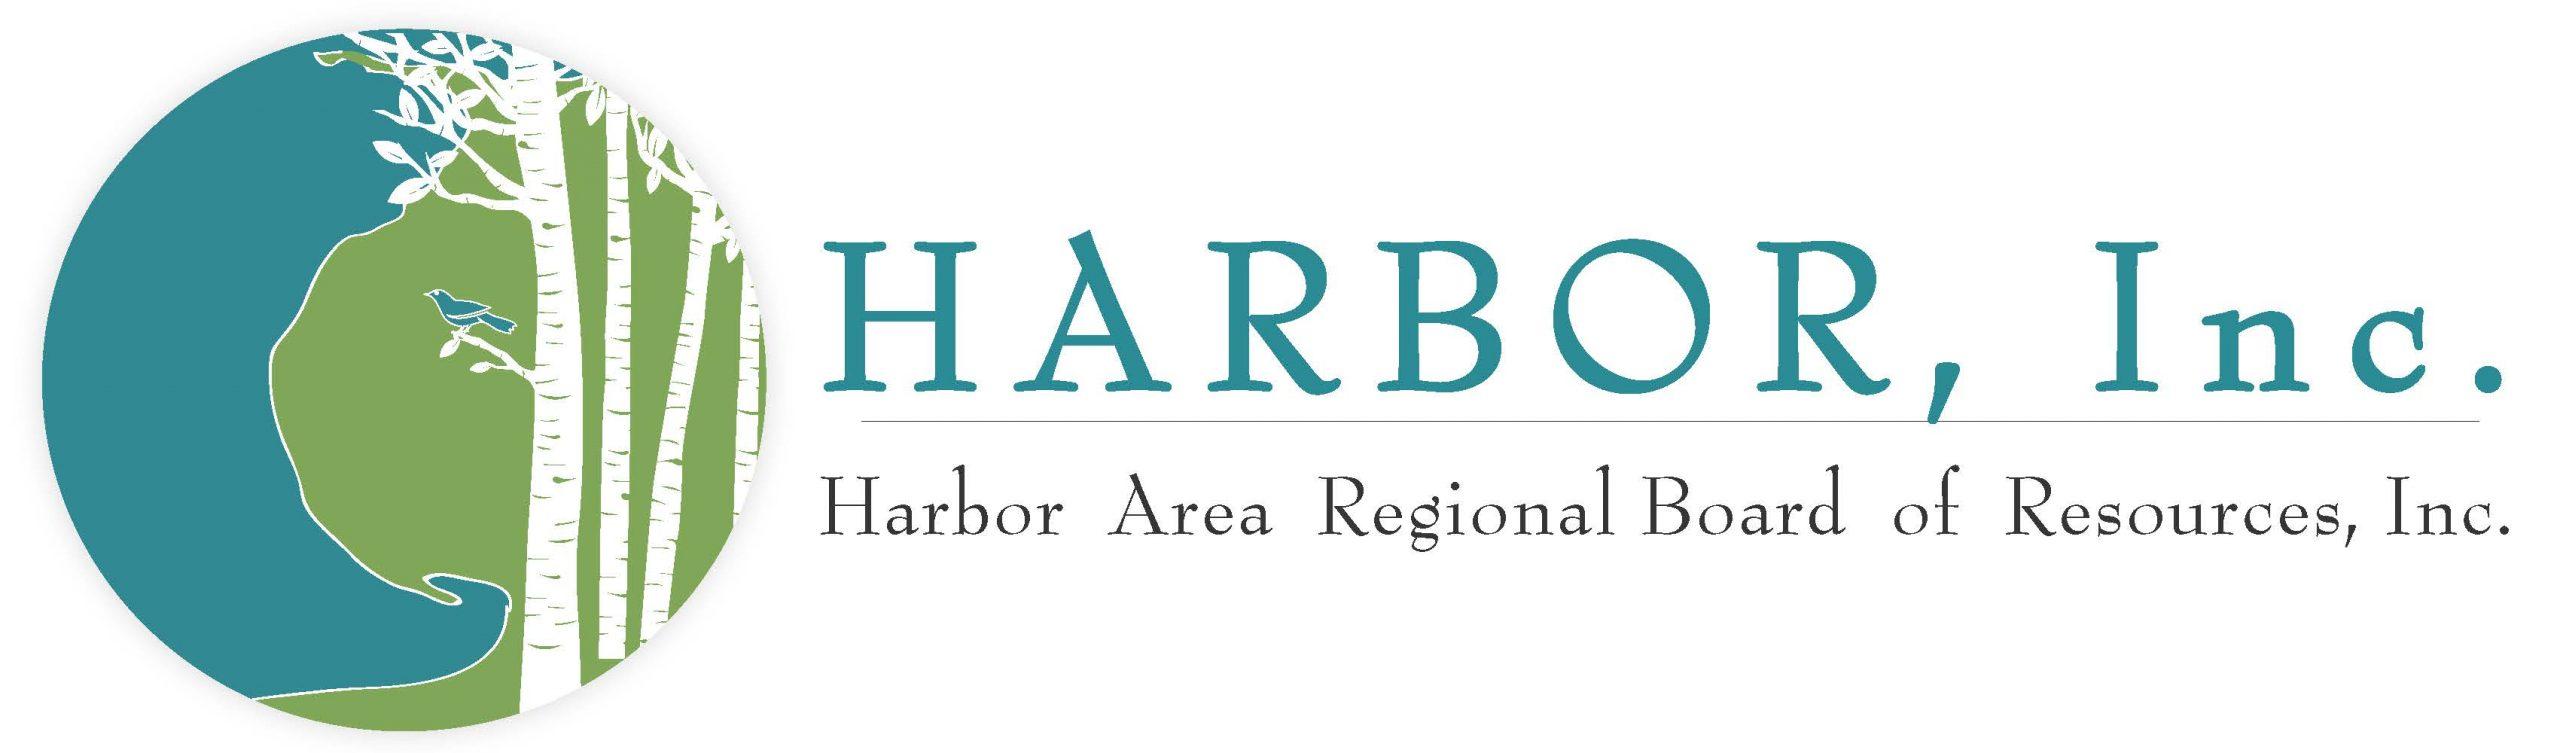 HarborInc2014LogoWithNamenoperiod 1